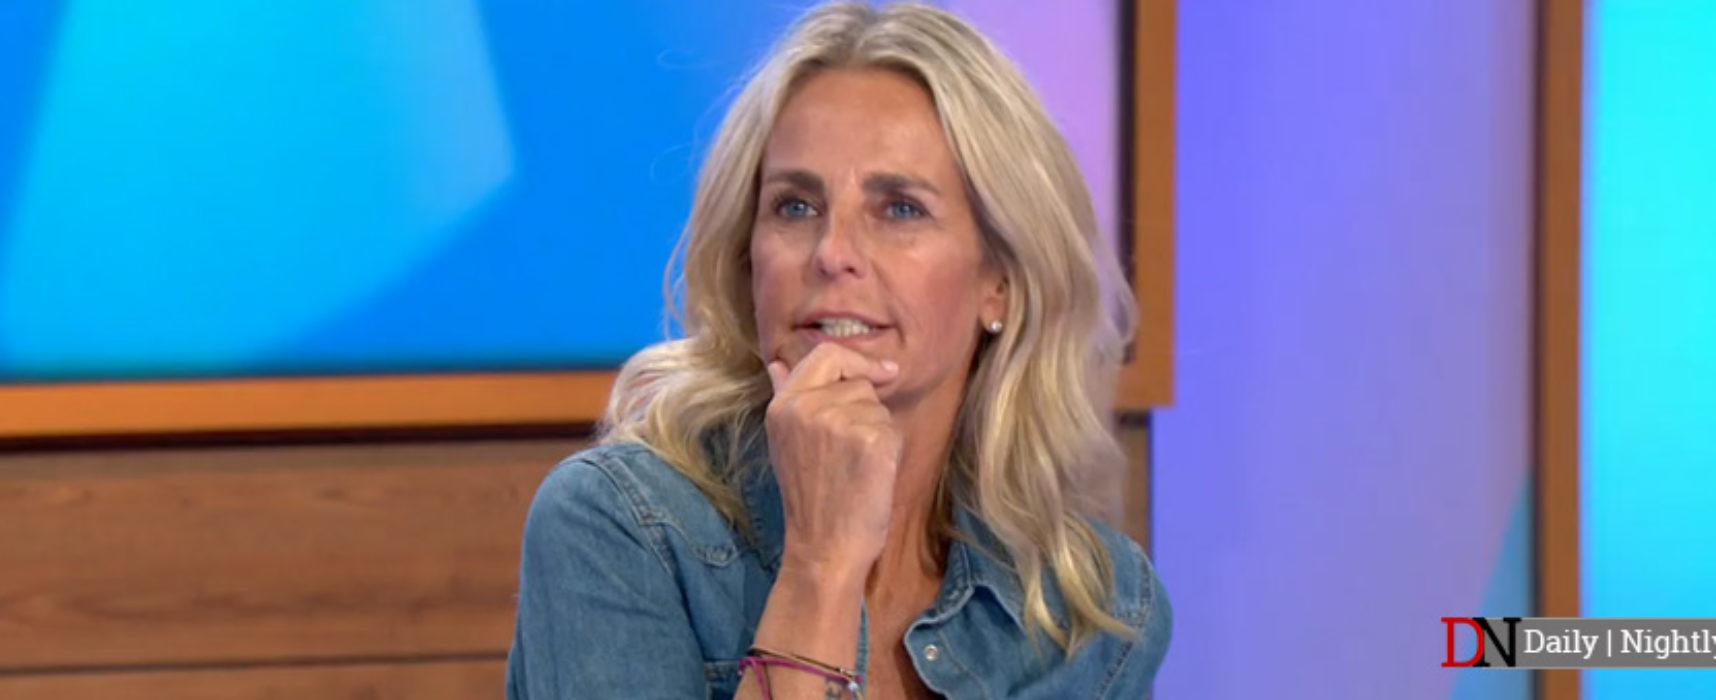 Ulrika Jonsson ponders getting back into sex